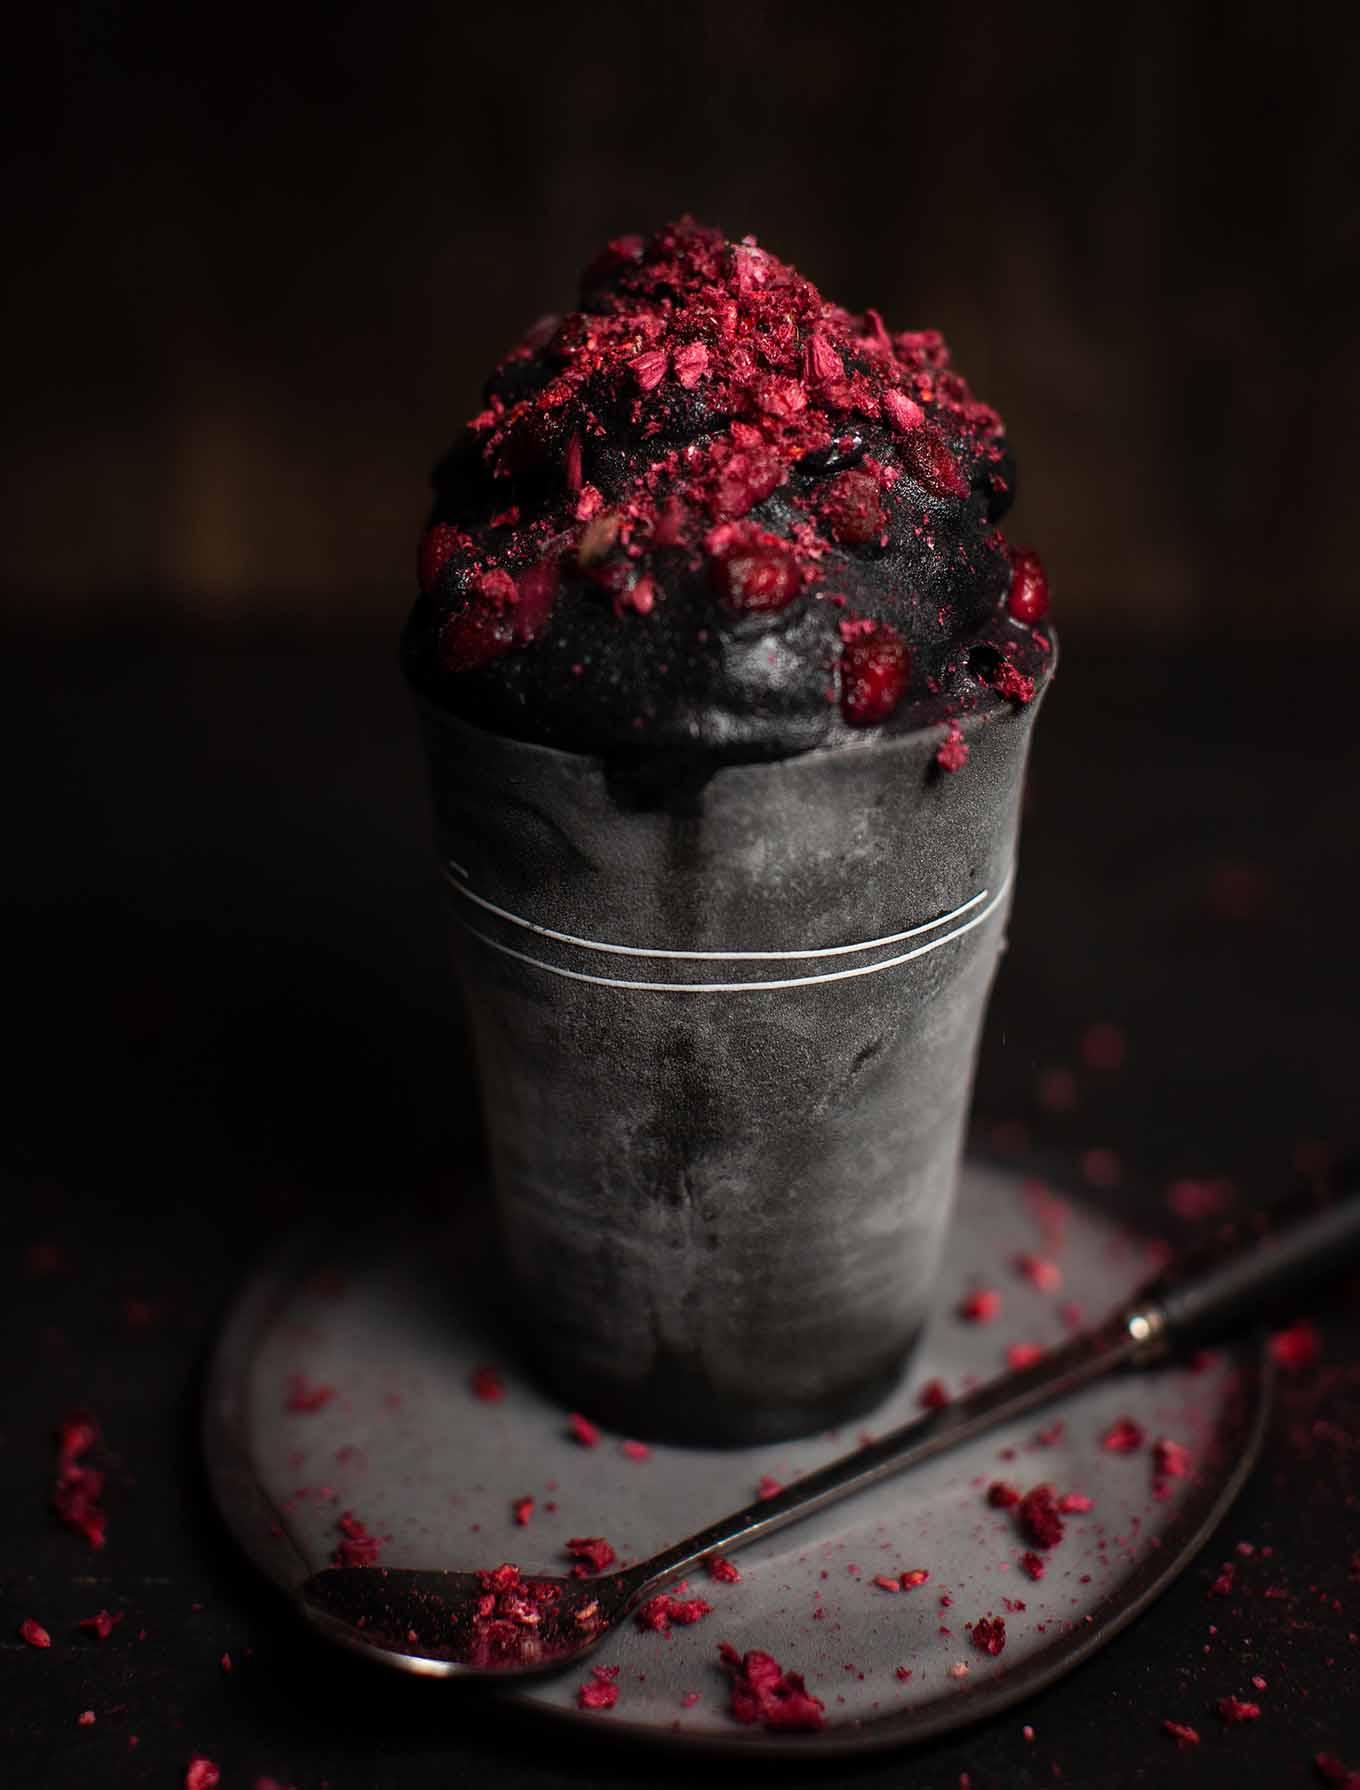 Charcoal Raspberry Nicecream